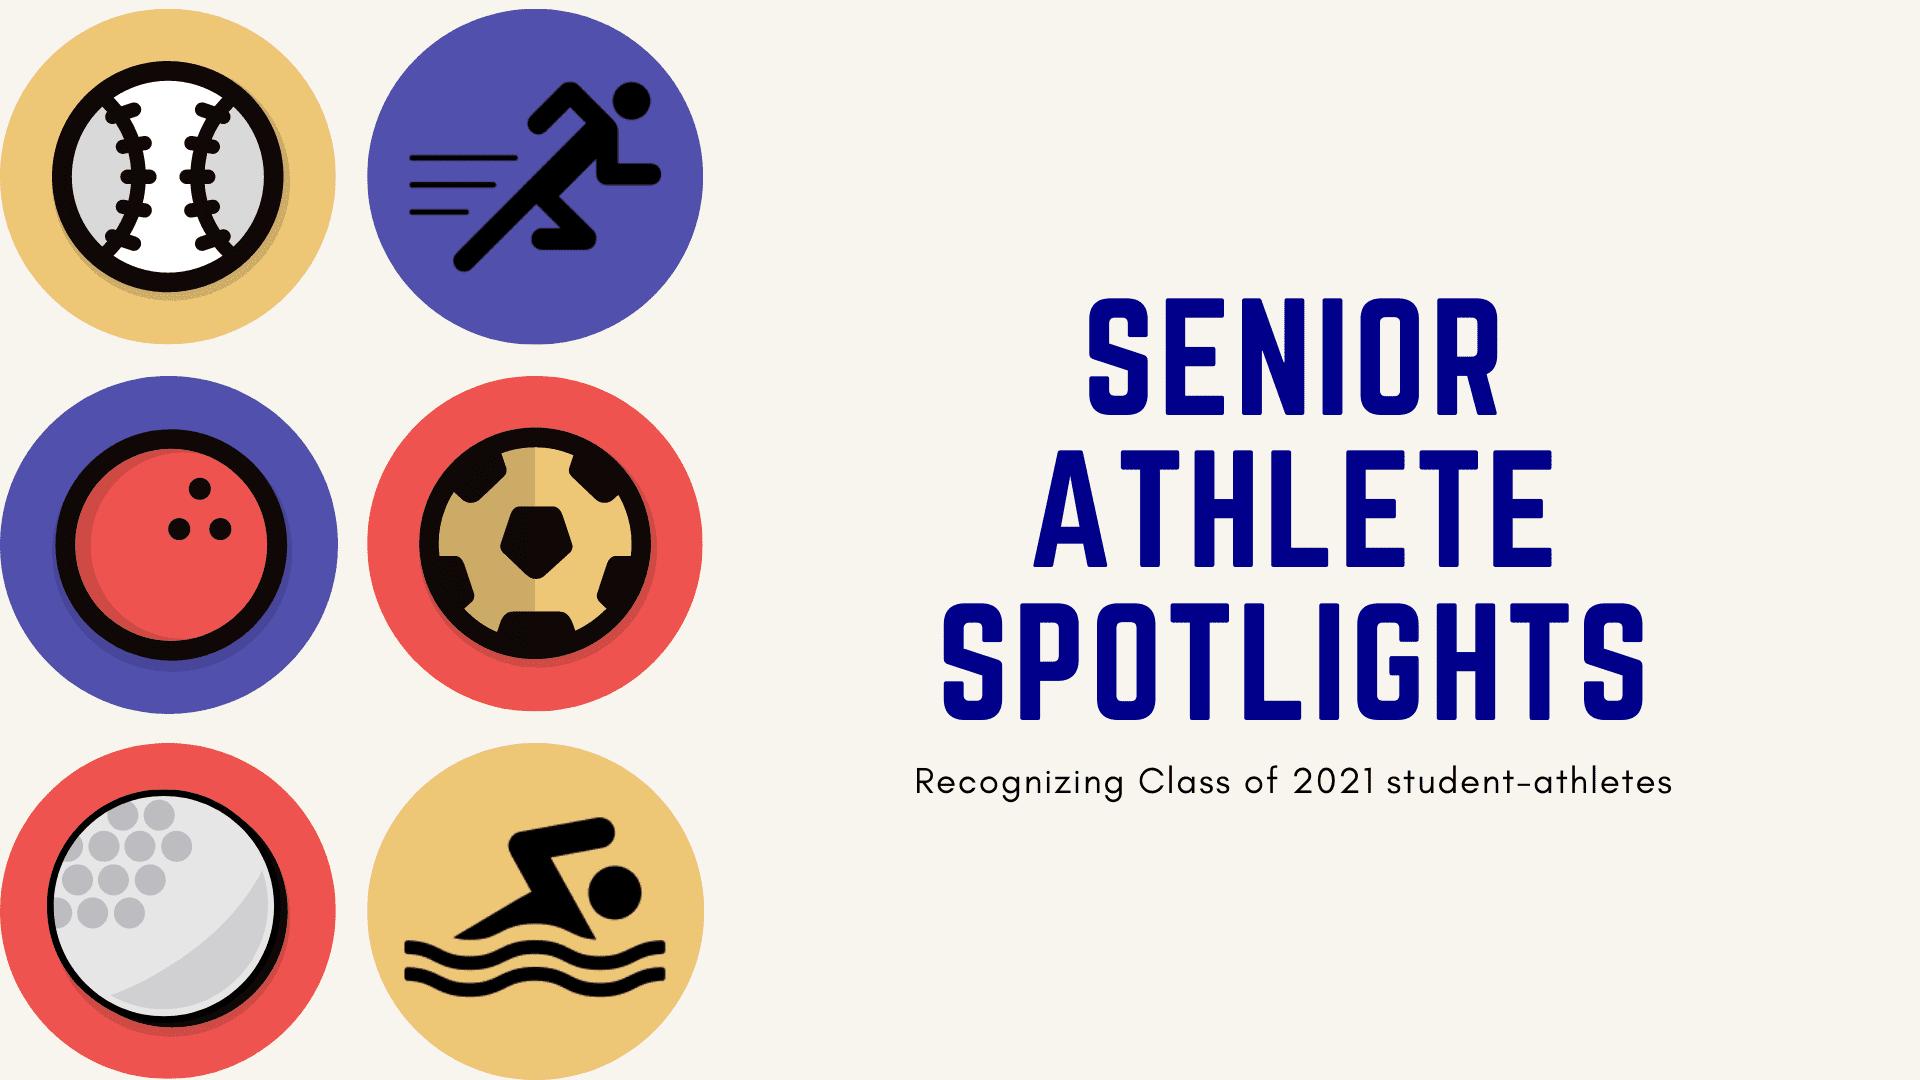 senior athlete spotlights recognizing class of 2021 student-athletes